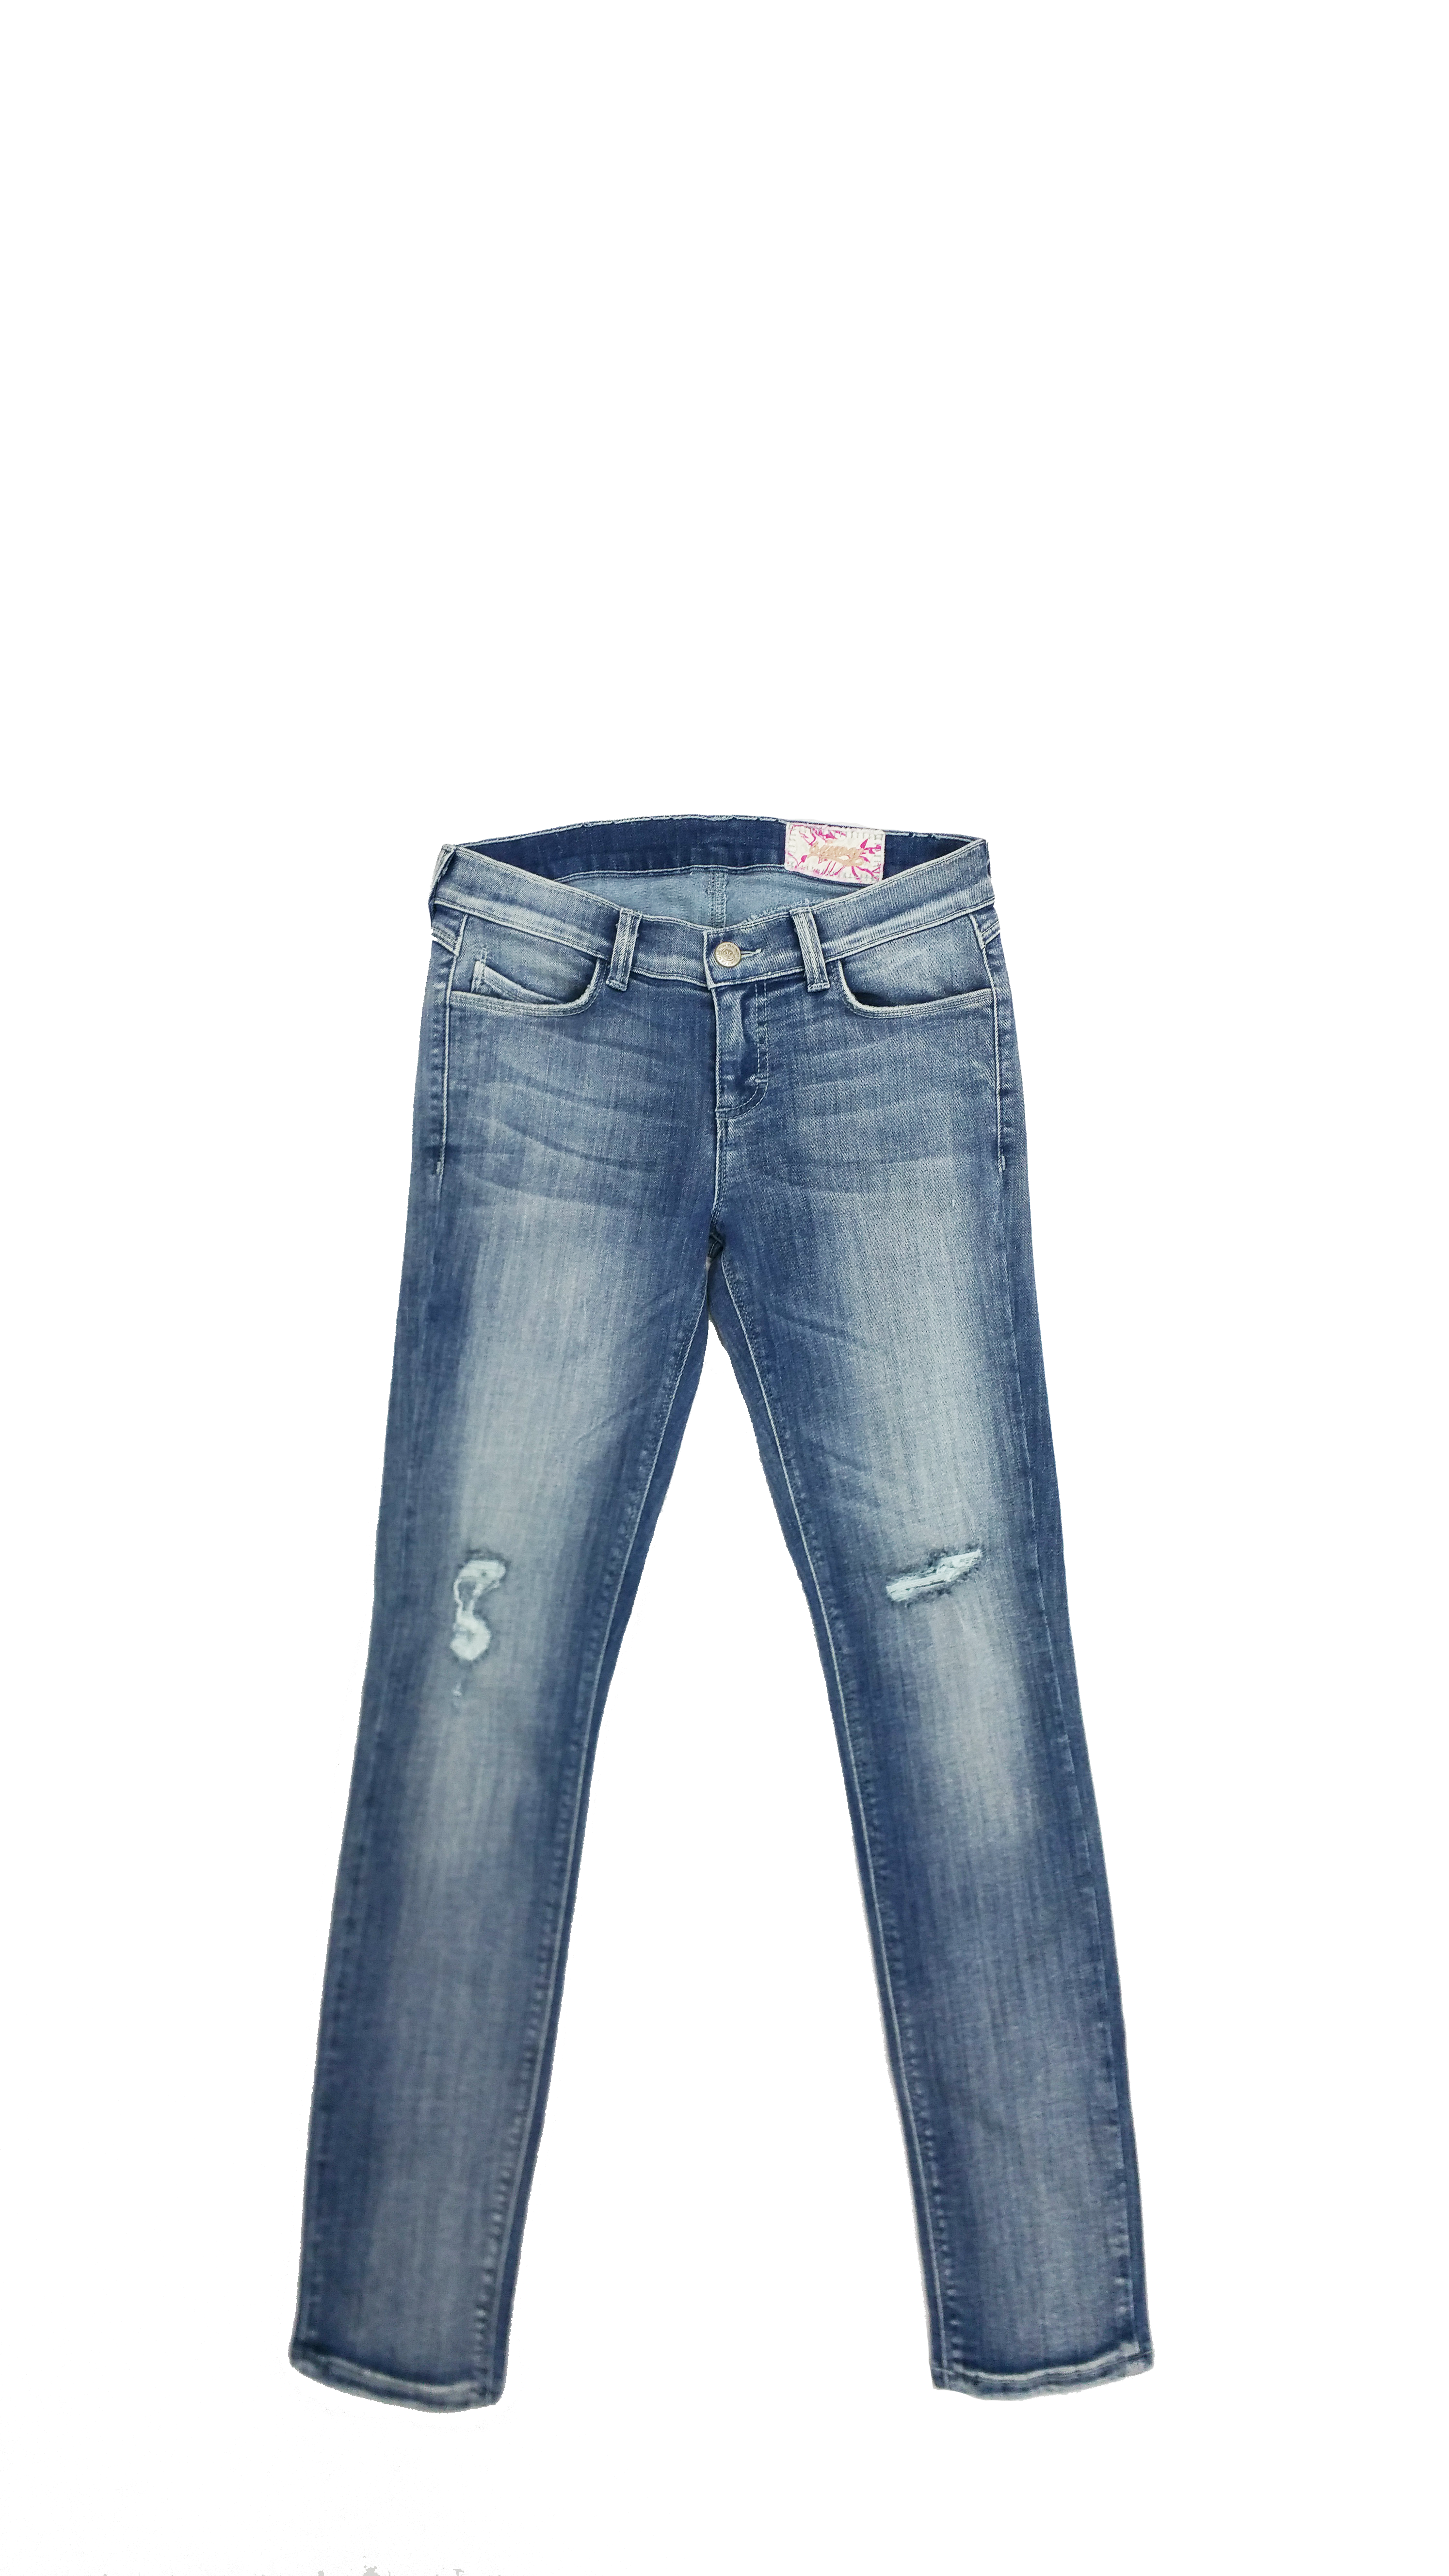 Acid wash jeans fashion 15